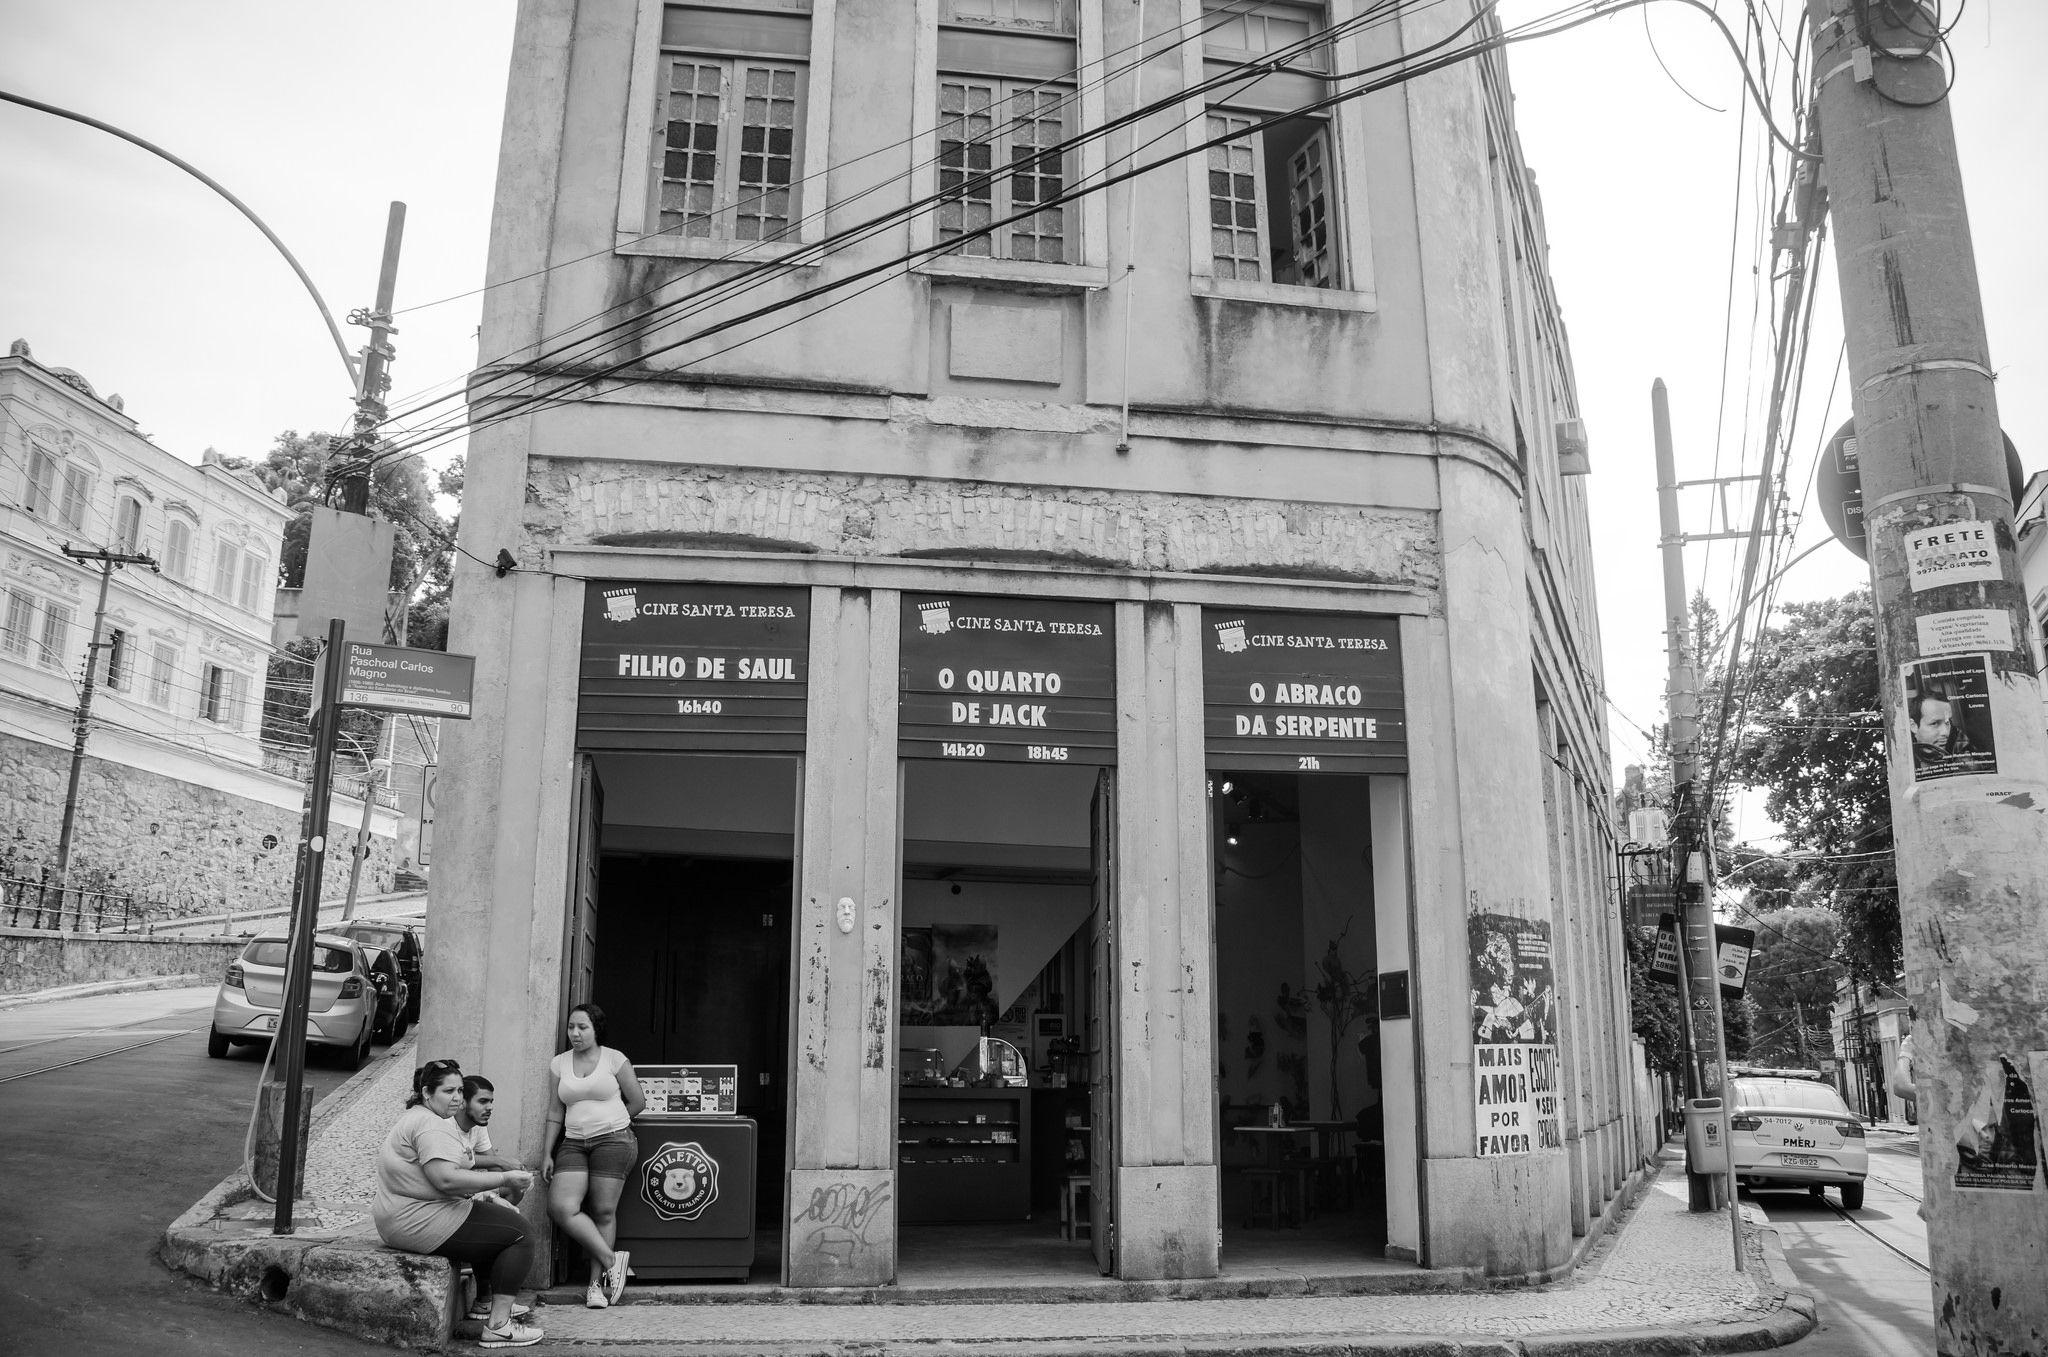 https://flic.kr/p/HioWdP | Largo do Guimaraes | Rio De Janeiro, RJ, Brazil - March 07, 2016: Cinema in Largo do Guimaraes along the road of Santa Teresa District,  important point of Rio De Janeiro.